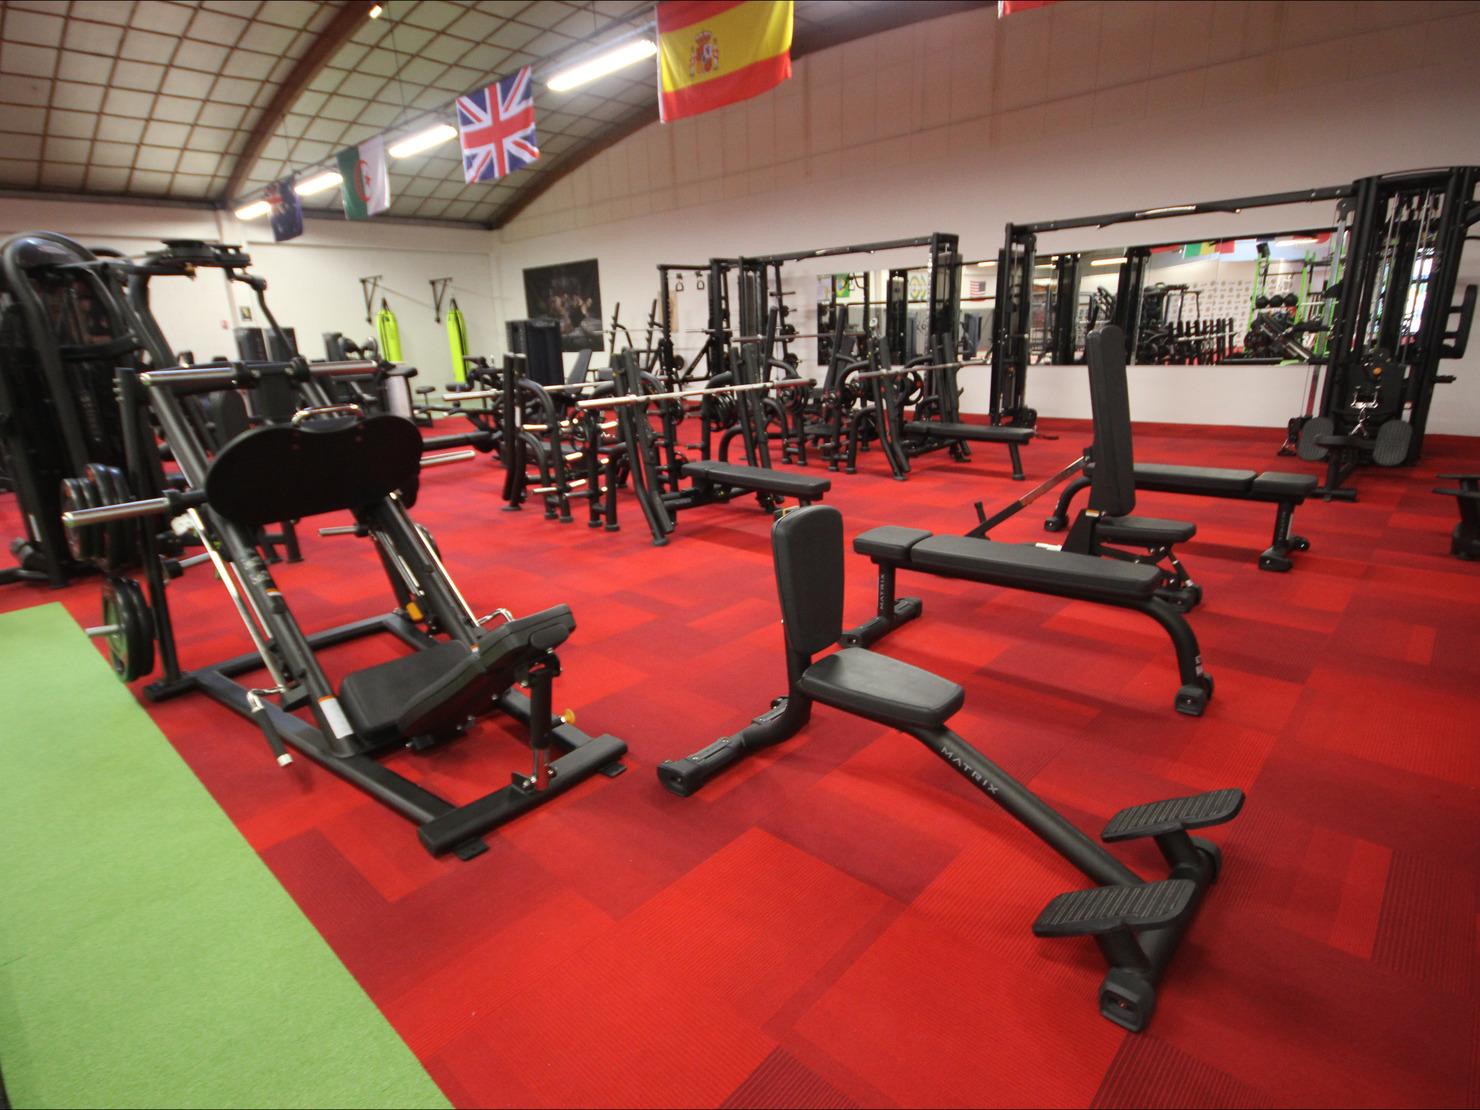 fight 39 ness gym nantes tarifs avis horaires essai gratuit. Black Bedroom Furniture Sets. Home Design Ideas